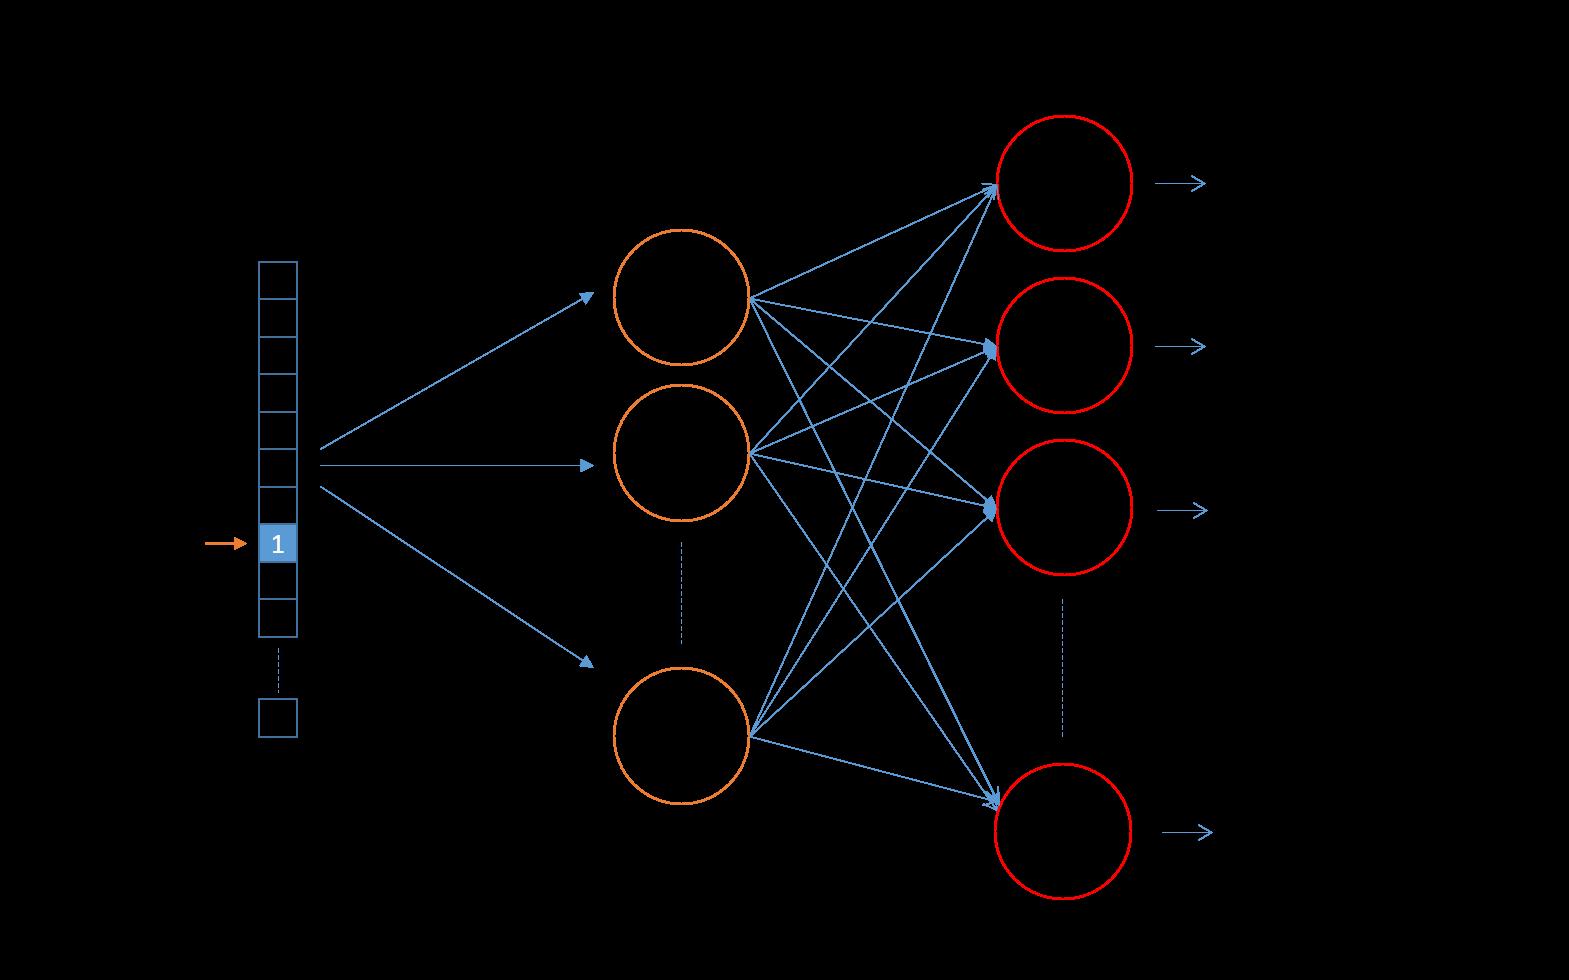 Skip-gram Neural Network Architecture